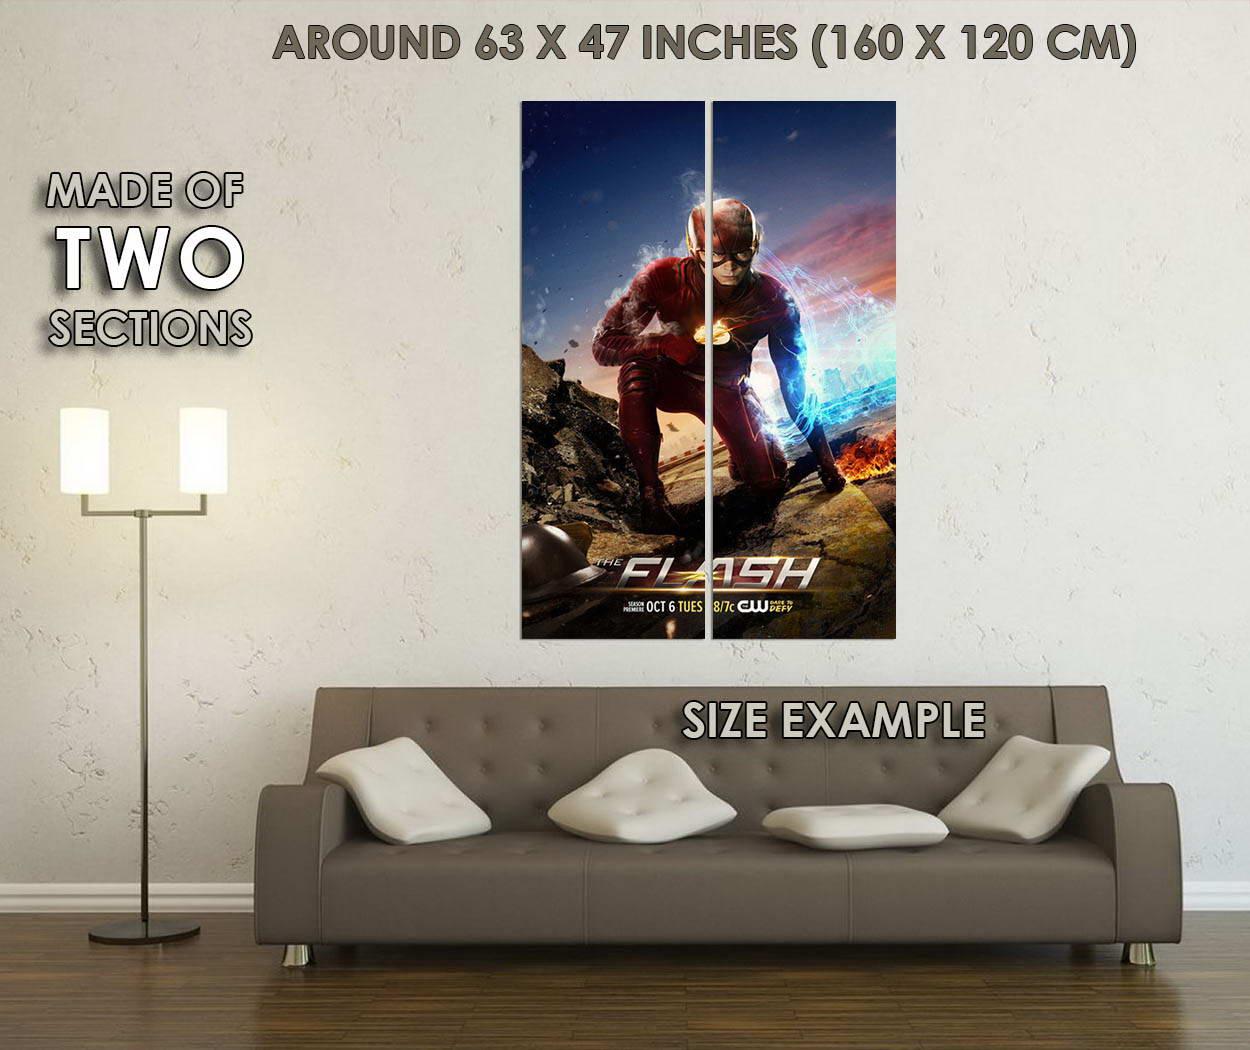 10718-The-Flash-Season-2-TV-Series-Art-LAMINATED-POSTER-CA thumbnail 6